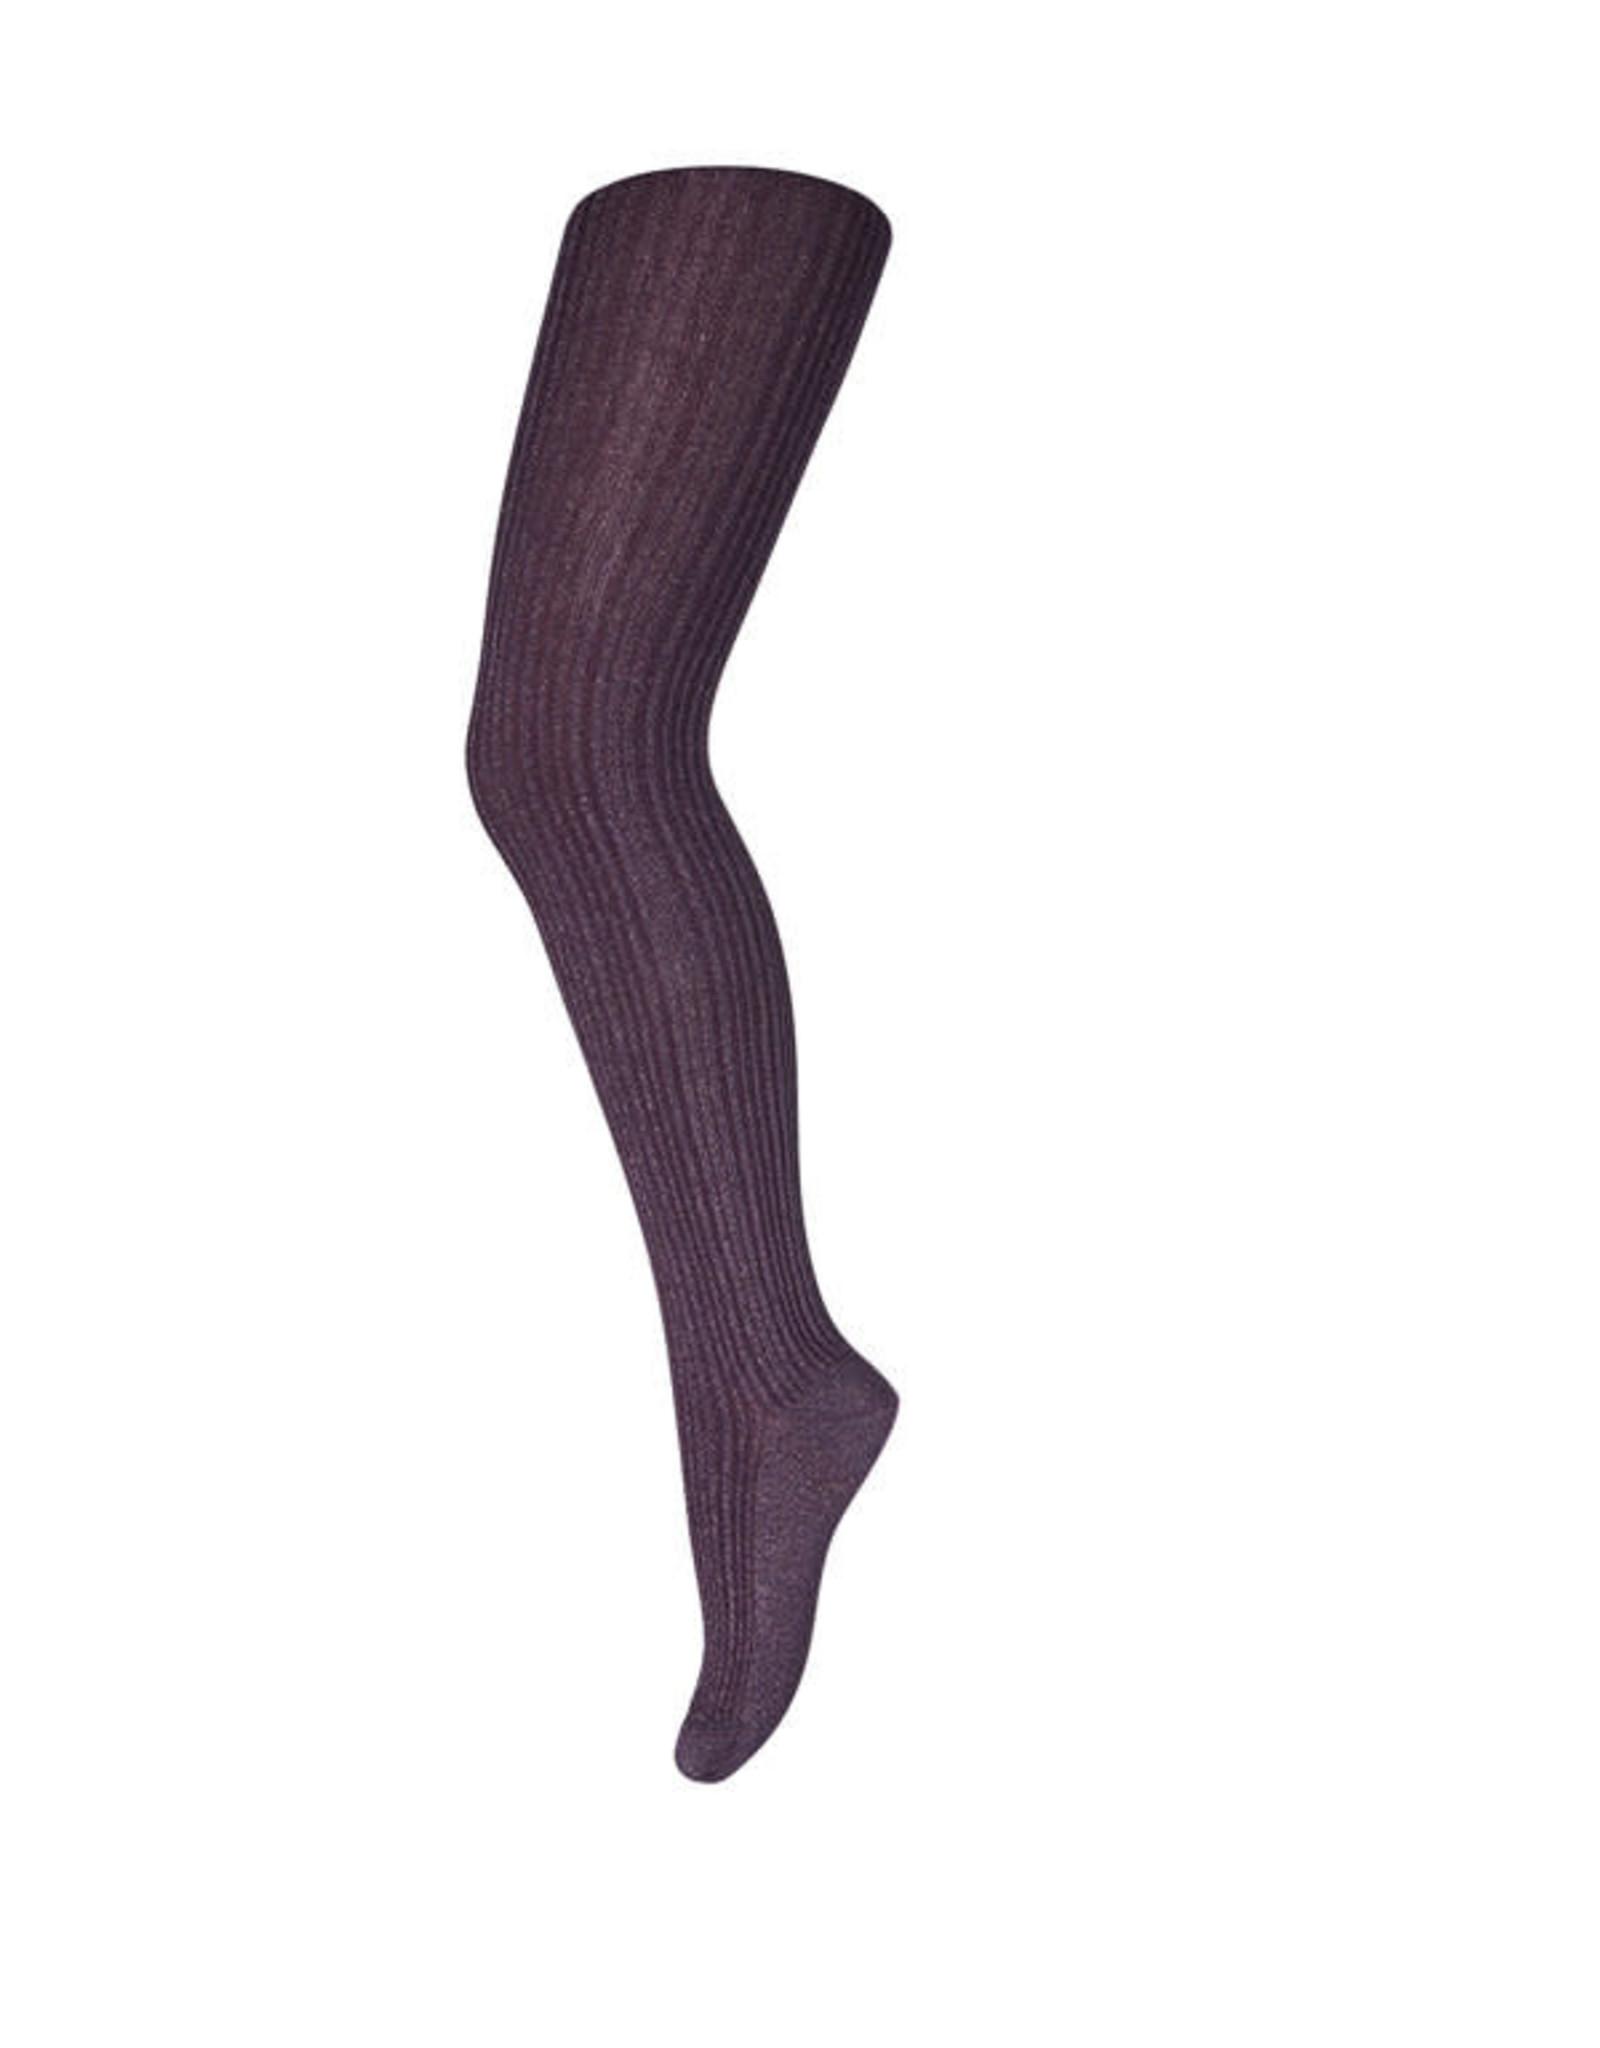 MP Denmark 19025 tights celosia with lurex // 180 dark grape